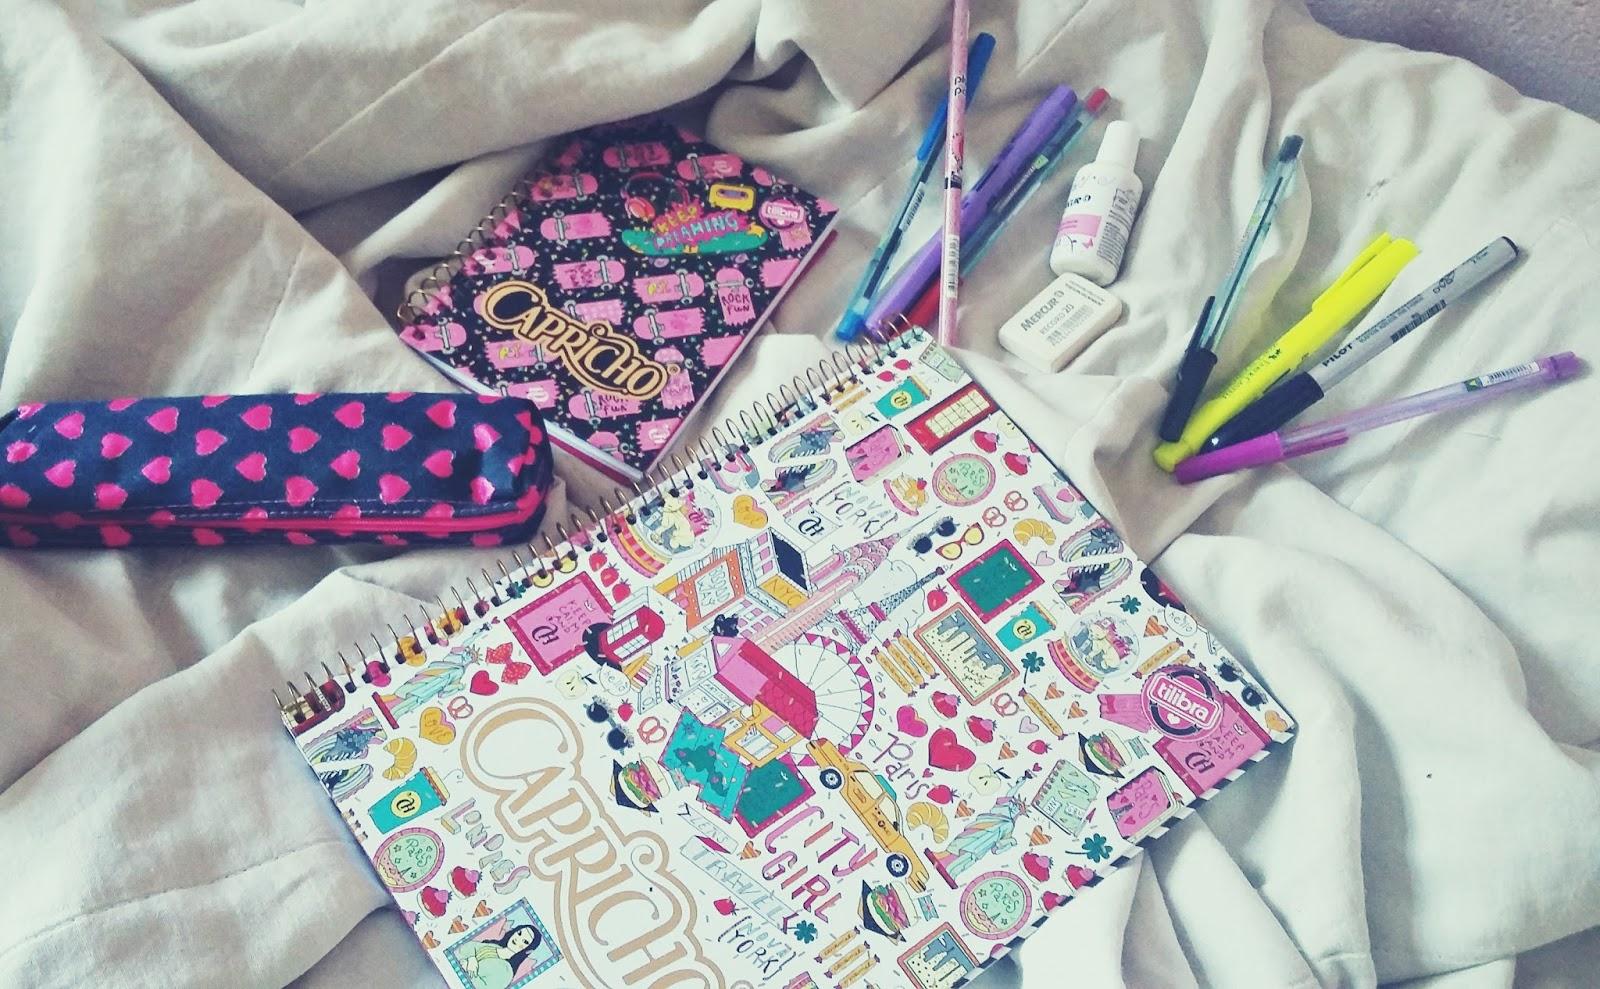 Volta às aulas | Back to school - O que comprei?!